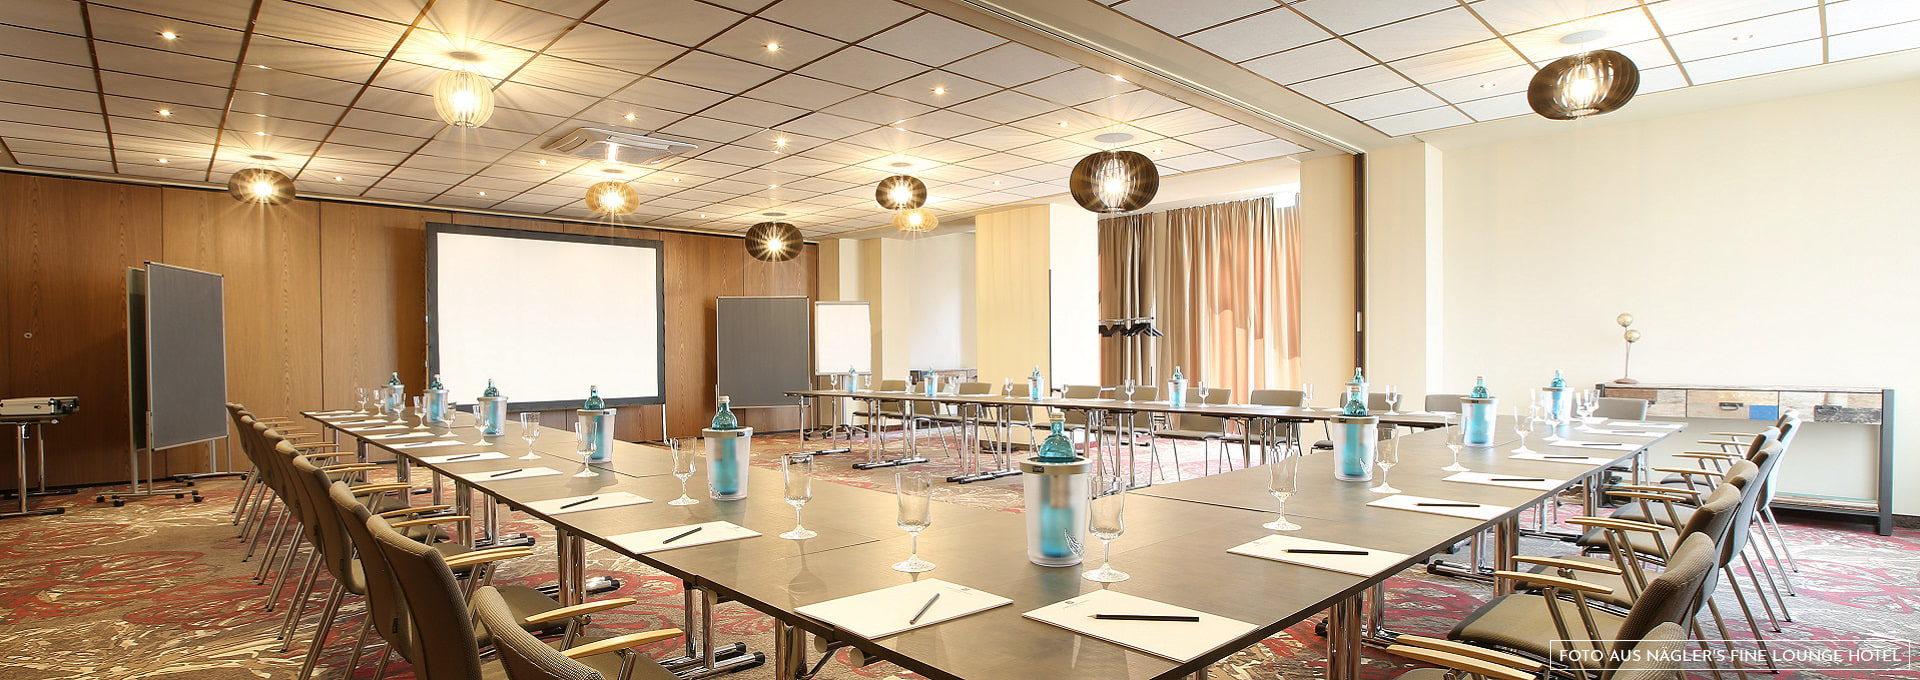 Tagungsraum Näglers Fine Lounge Hotel Oestrich-Winkel